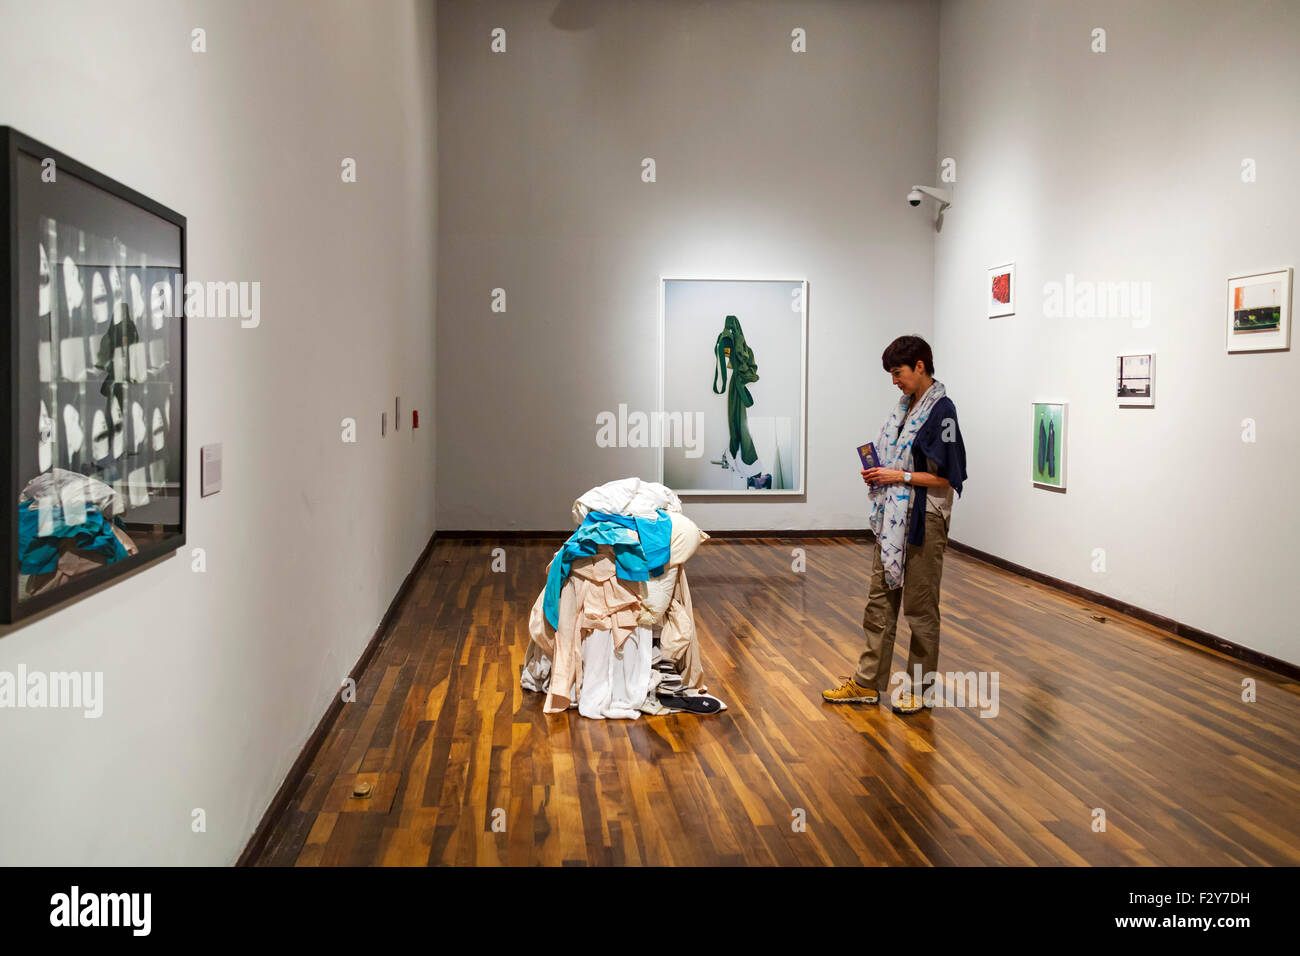 Moderne Kunstausstellung Instituto cultural Cabanas Guadalajara Jalisco Mexico North America Stockbild